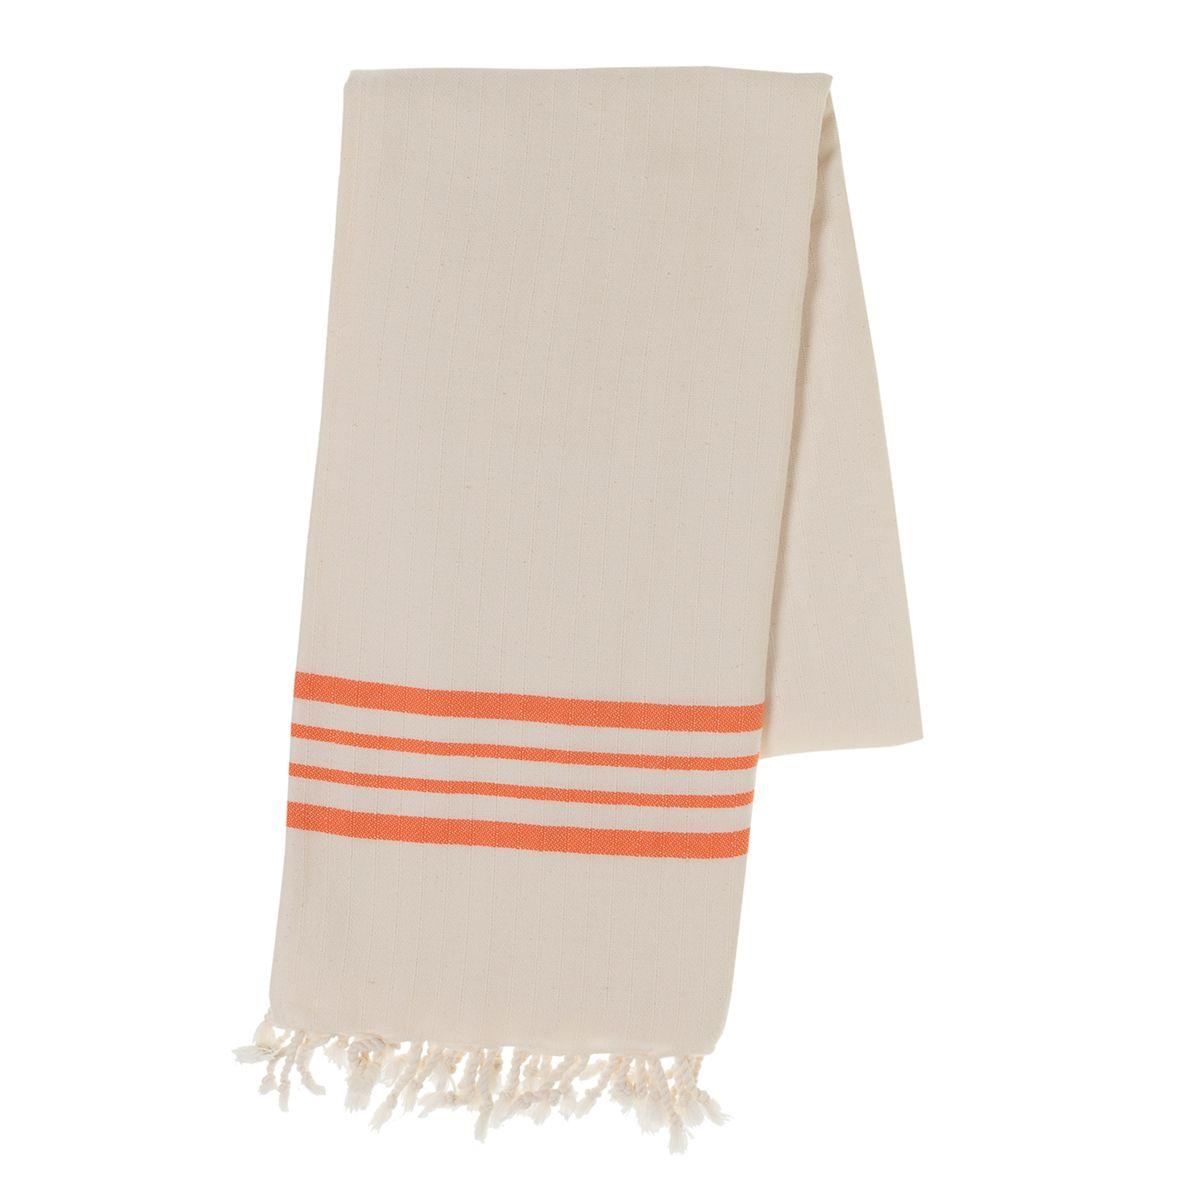 Peshtemal Sultan - Orange Stripes